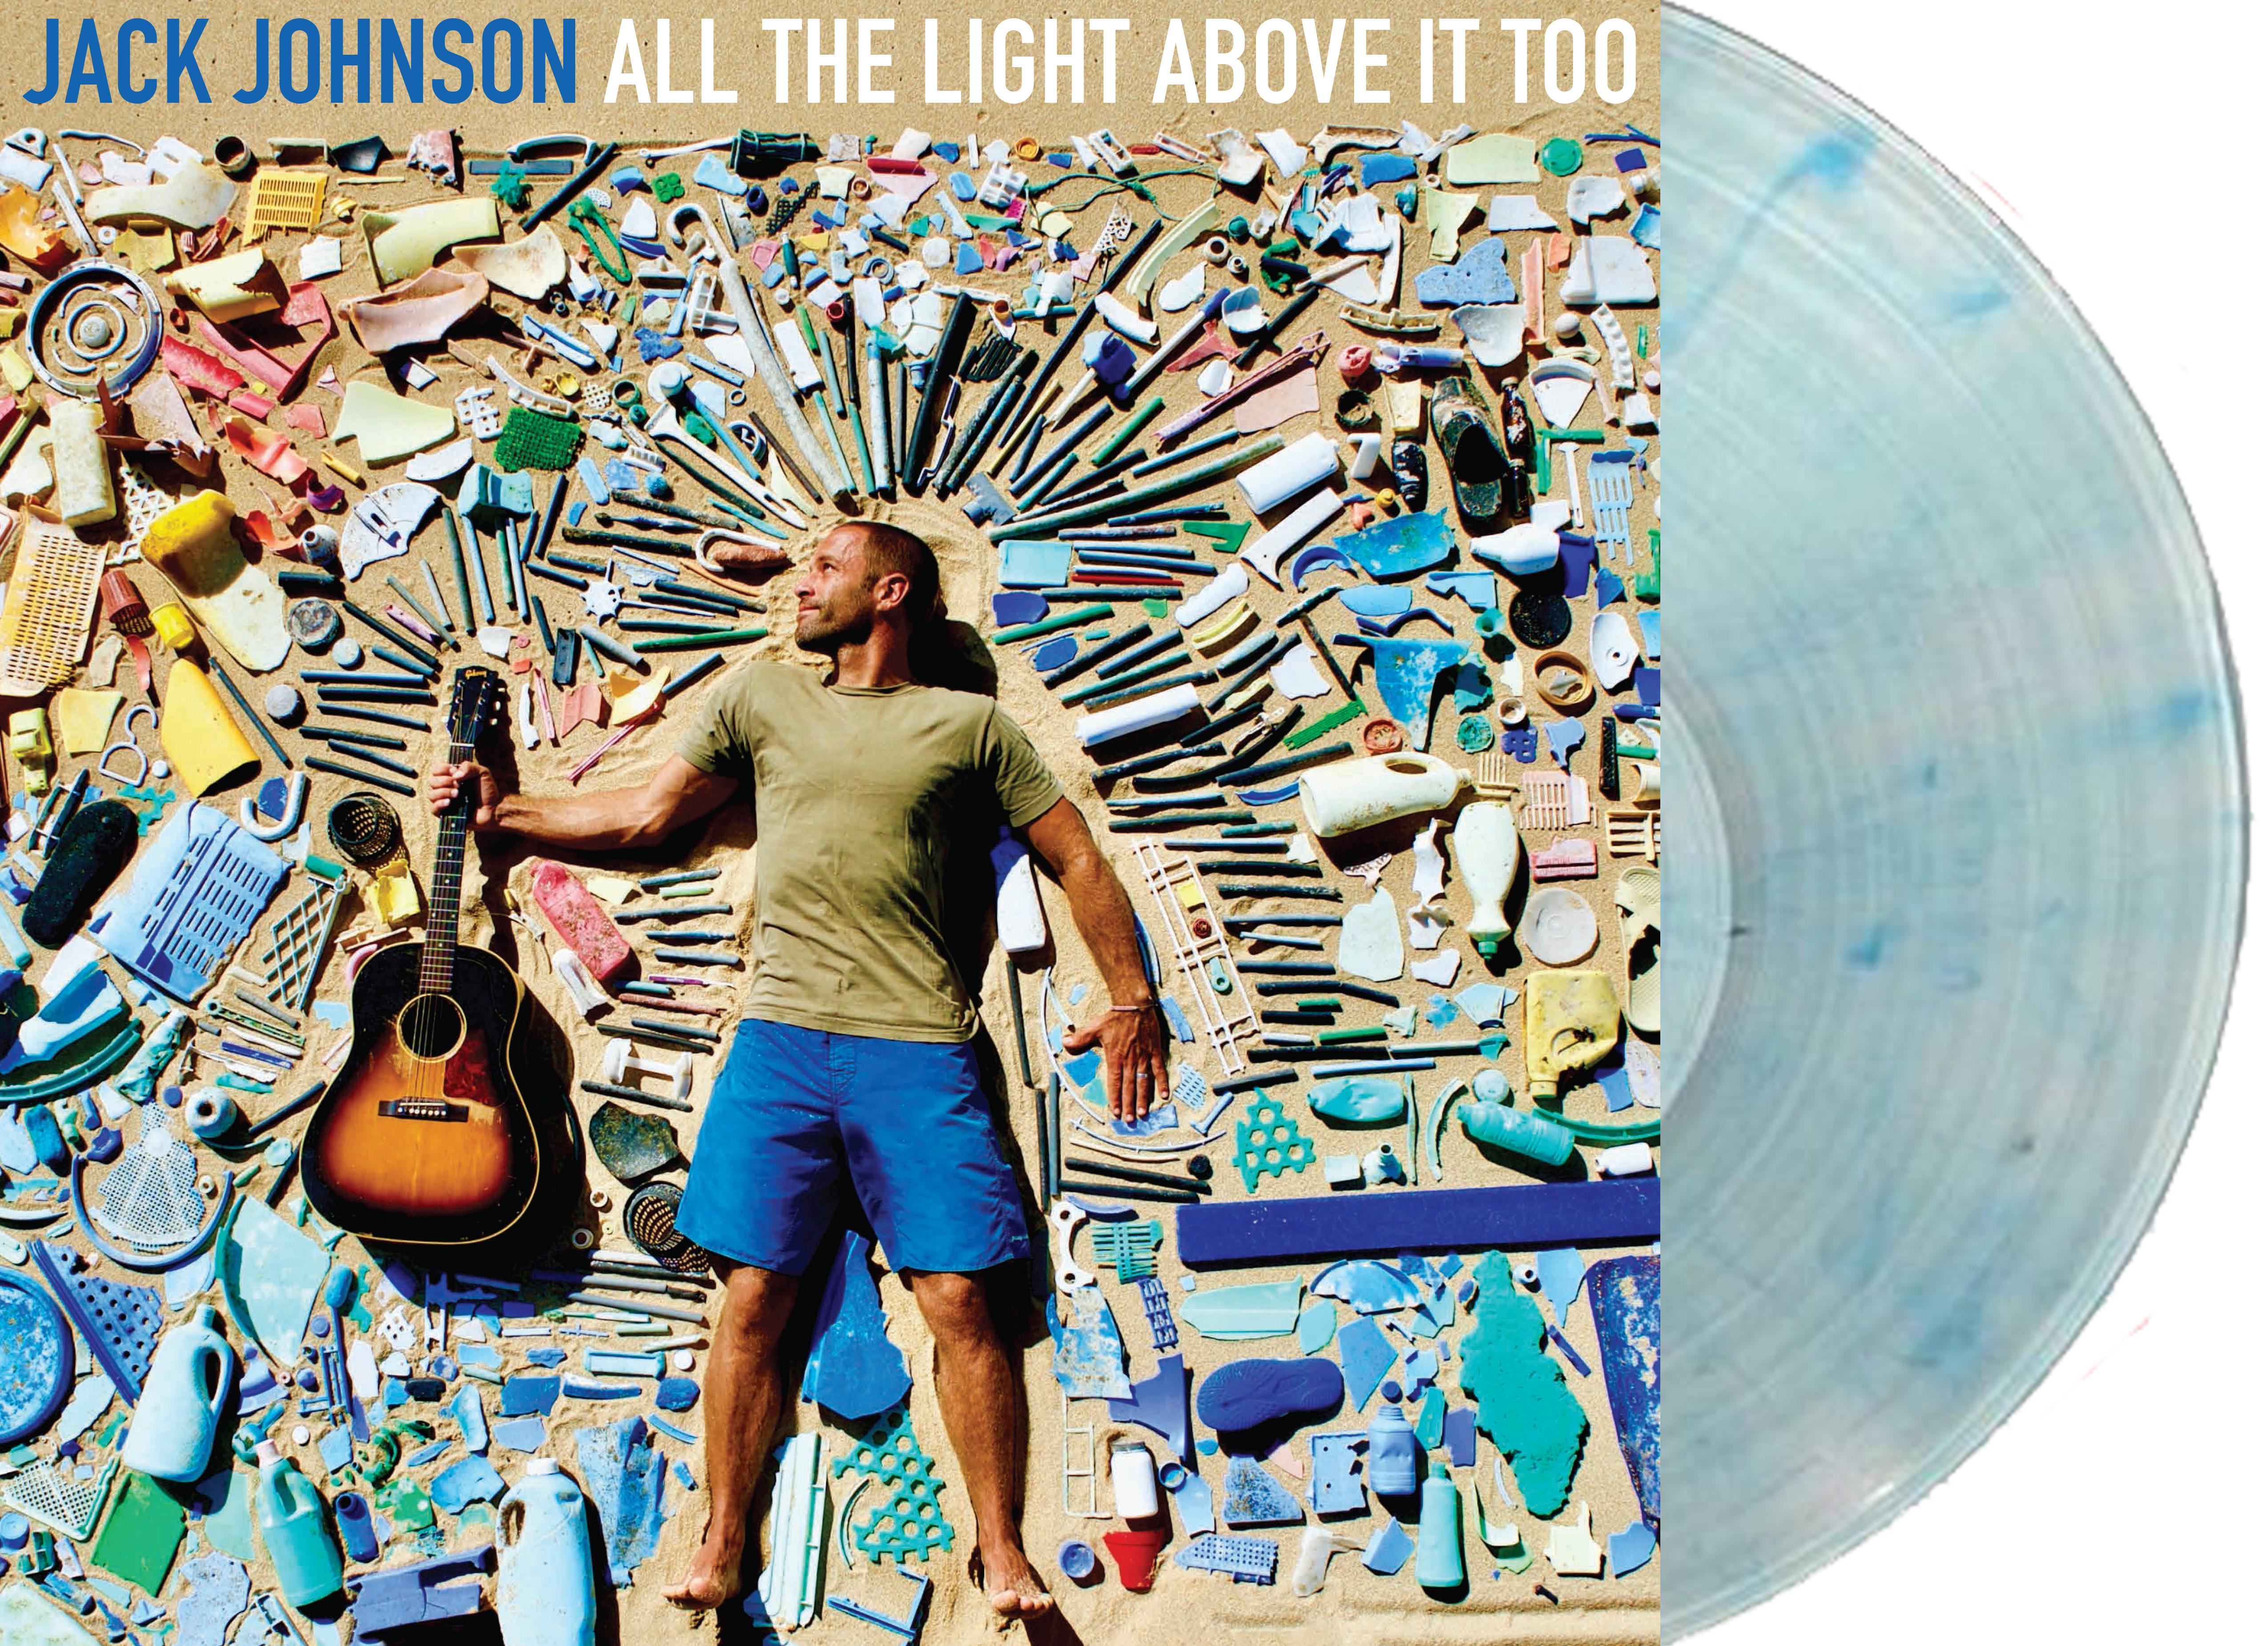 All The Light Above it Too Vinyl - Jack Johnson UK